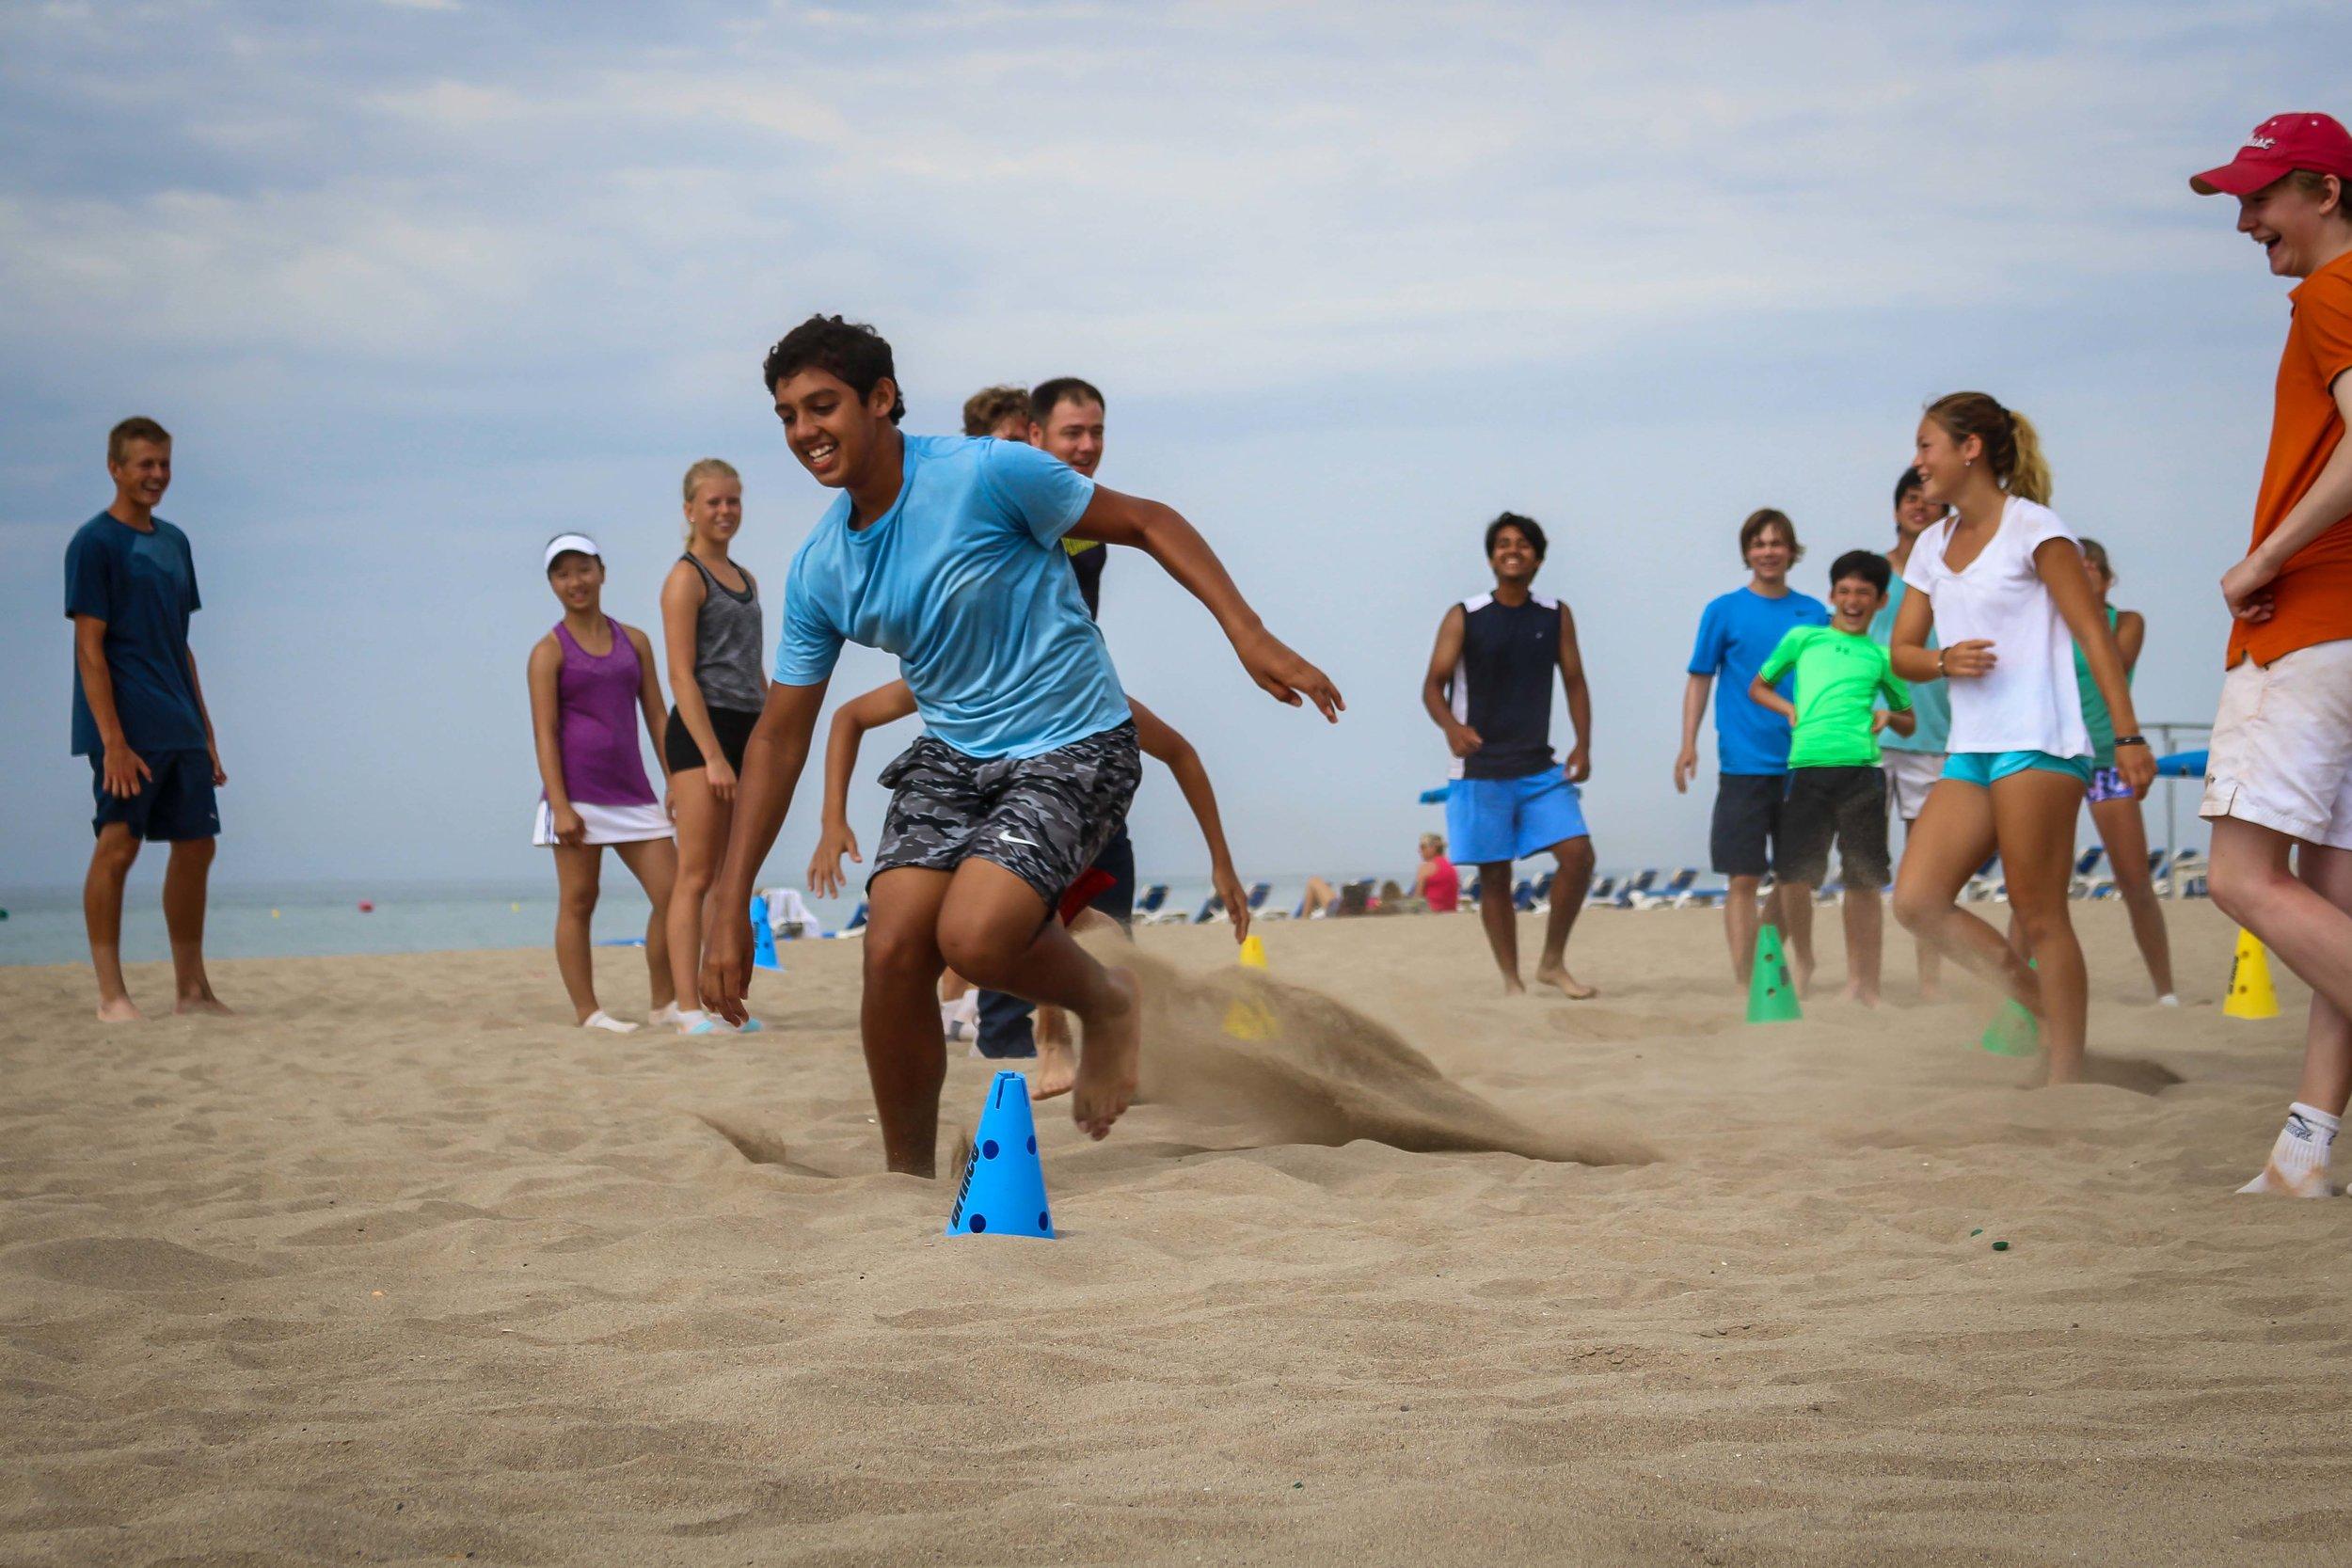 beach-bta-by-karolina-sznycer